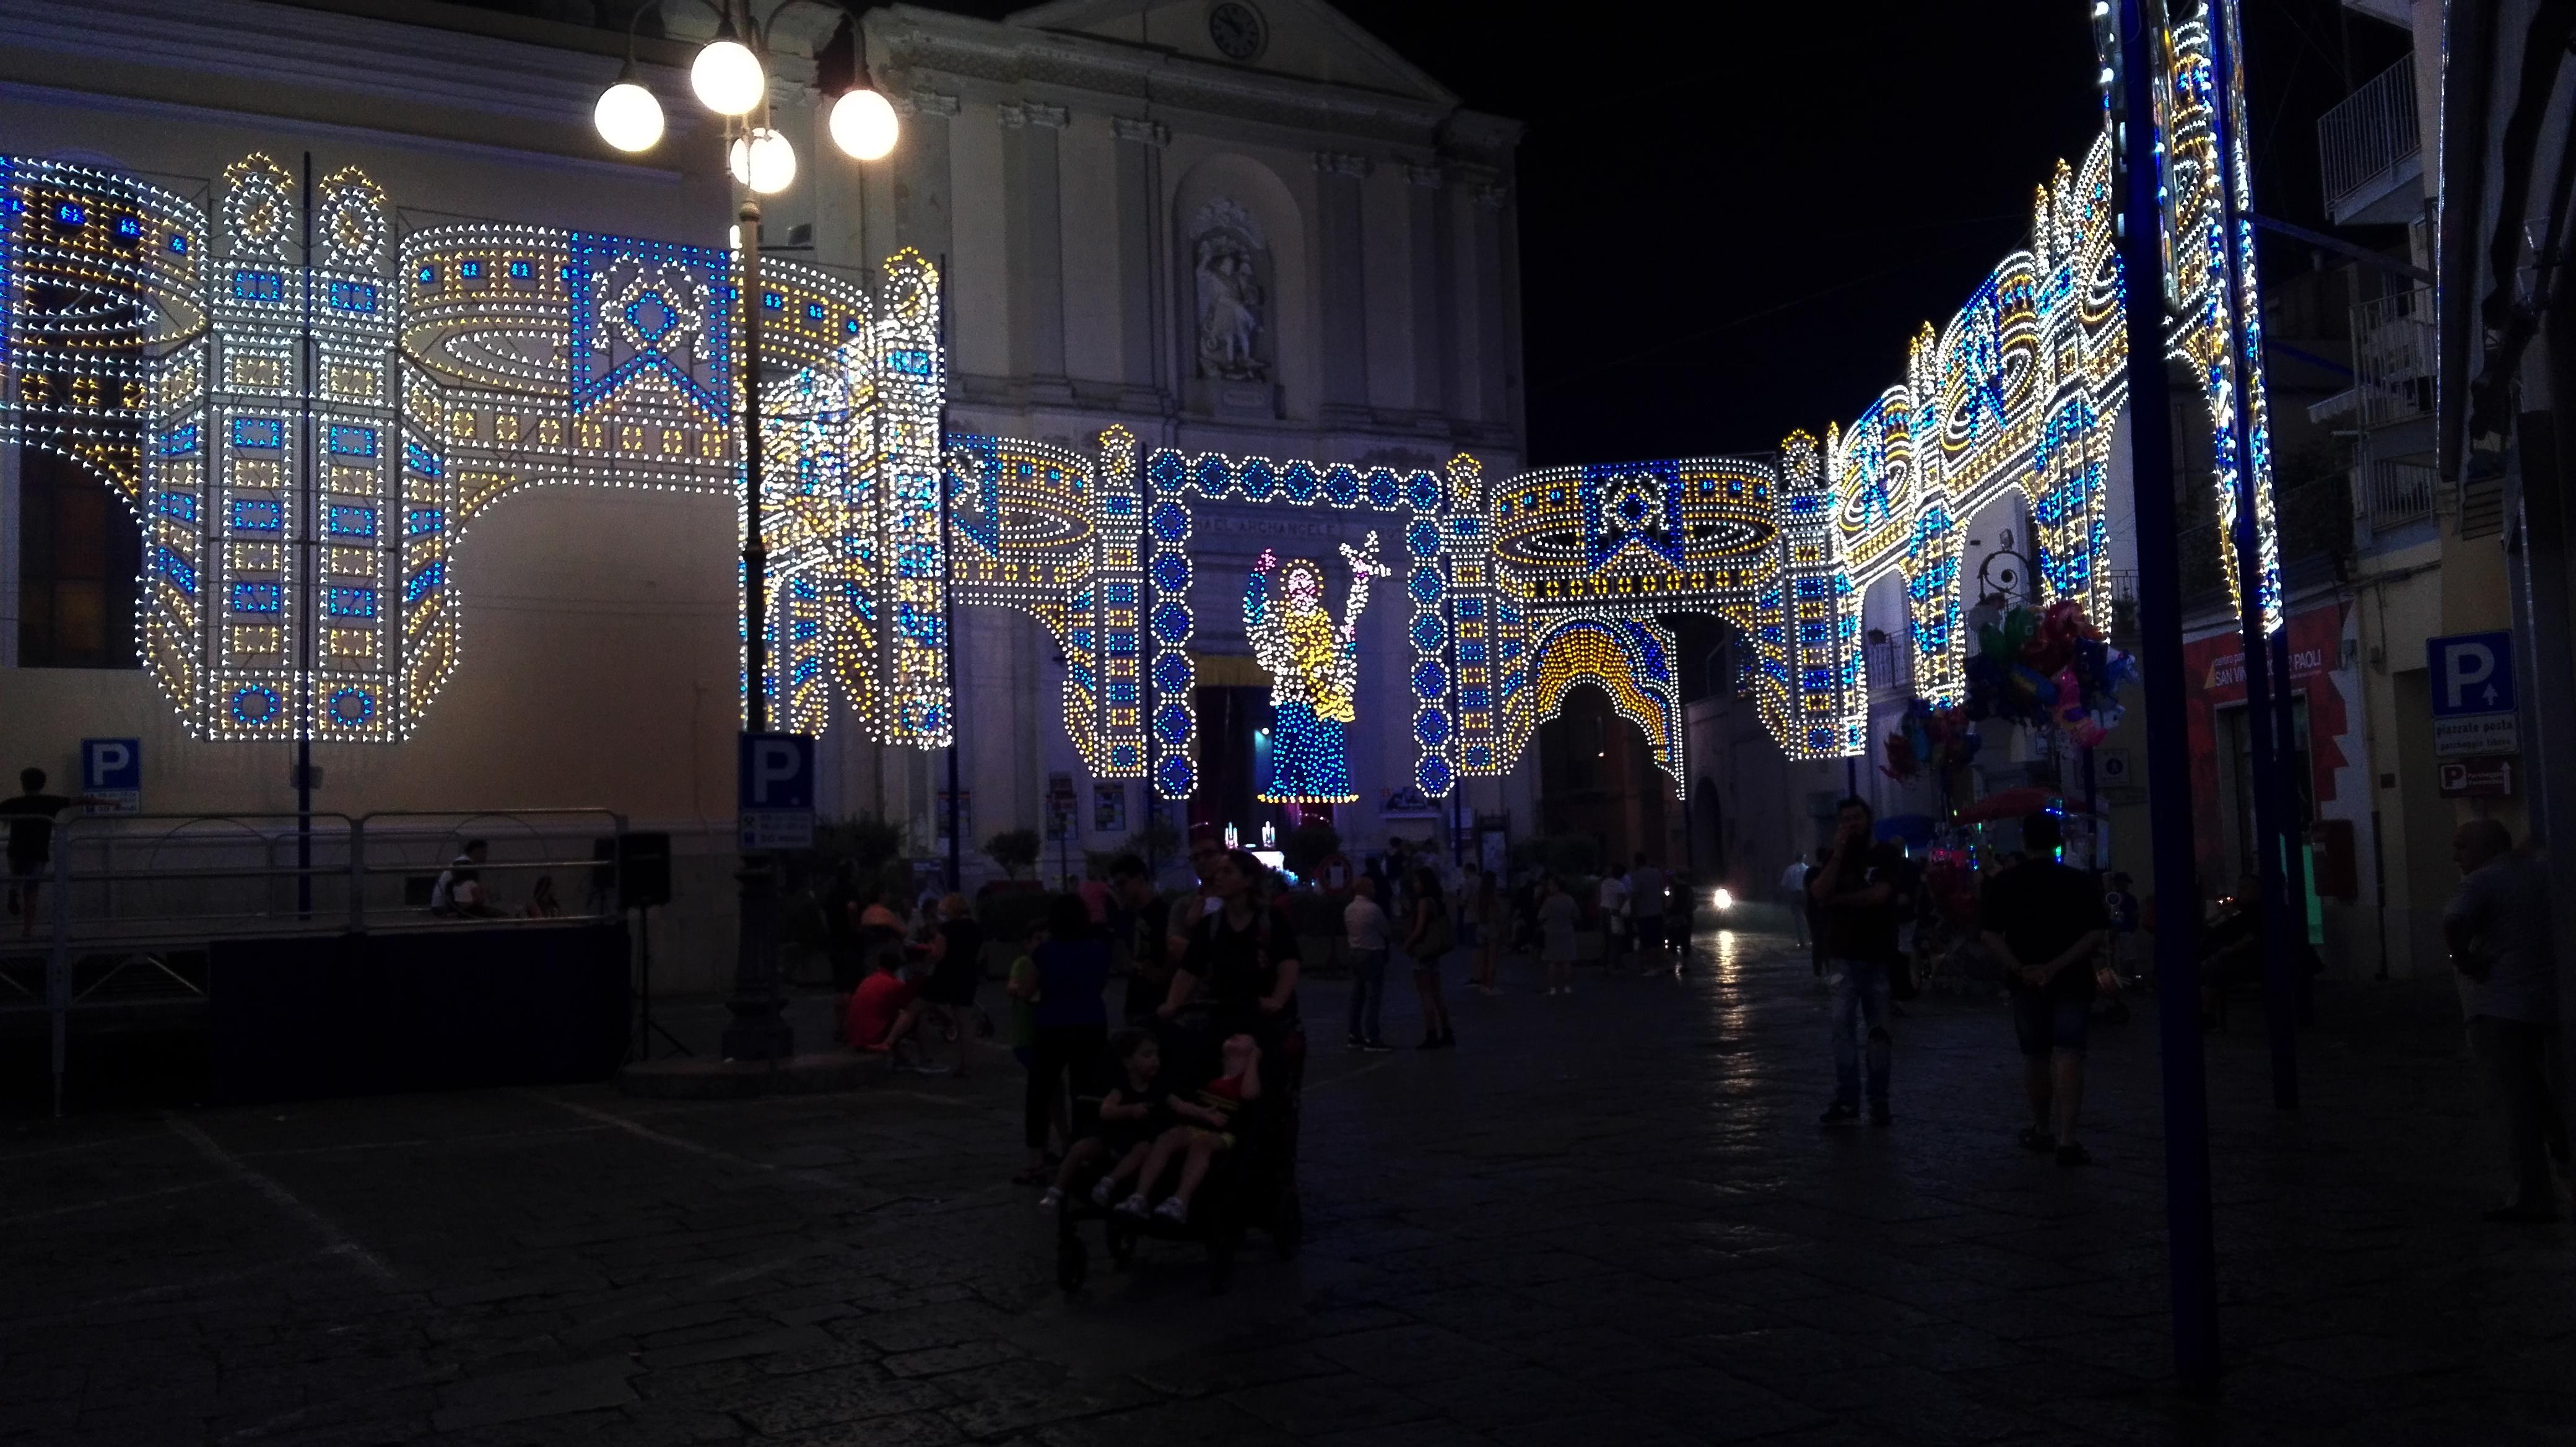 luminarie natale in piazza